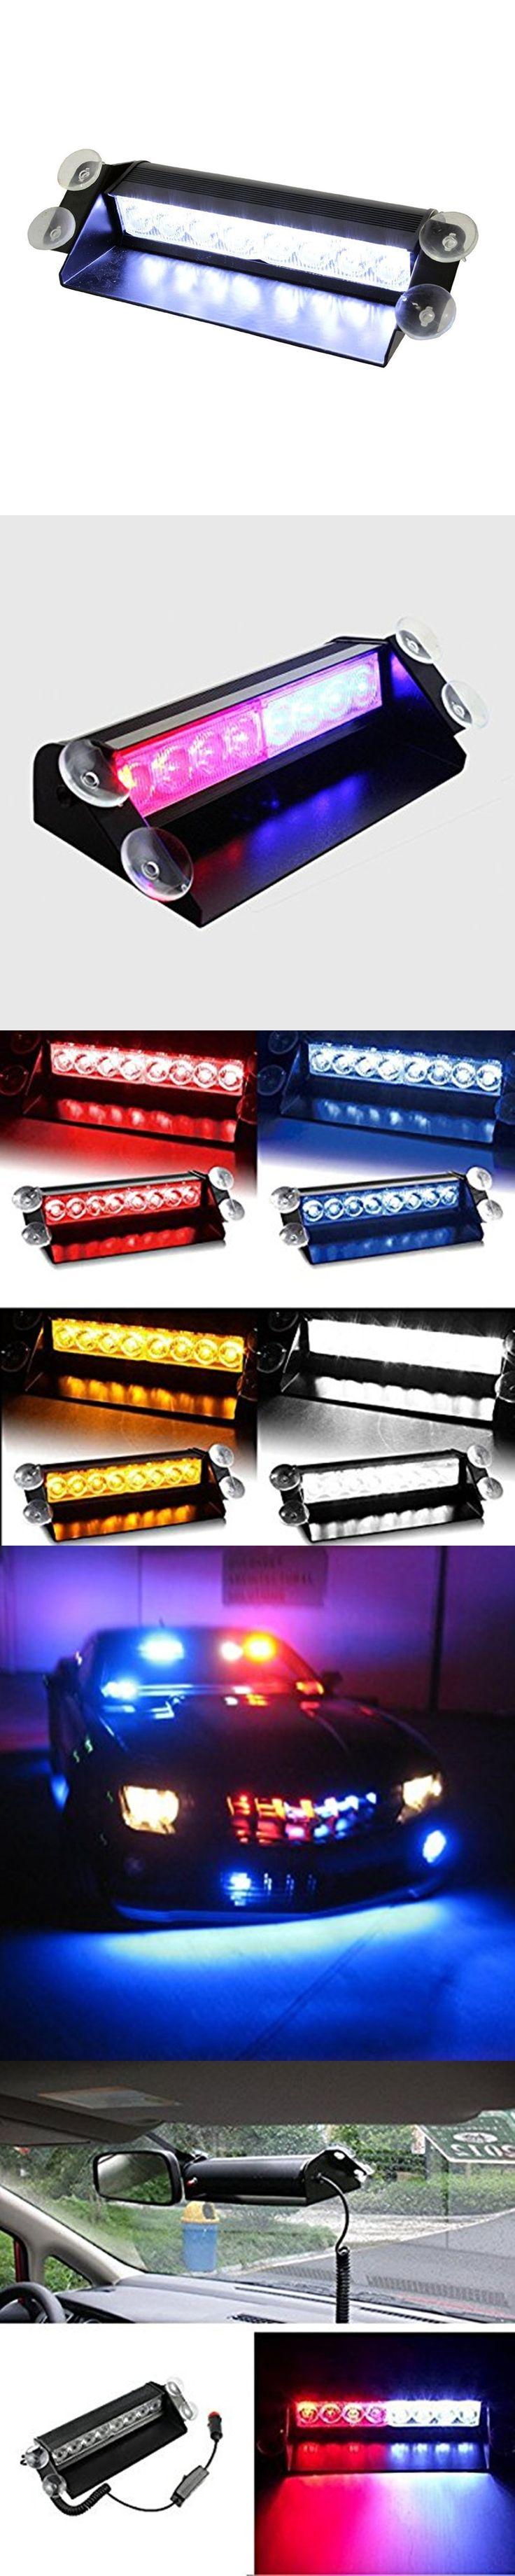 Car Styling 8 LED Colorful Warning Caution Van Truck Emergency Strobe Light Lamp Bar With Sucker On Windsheild